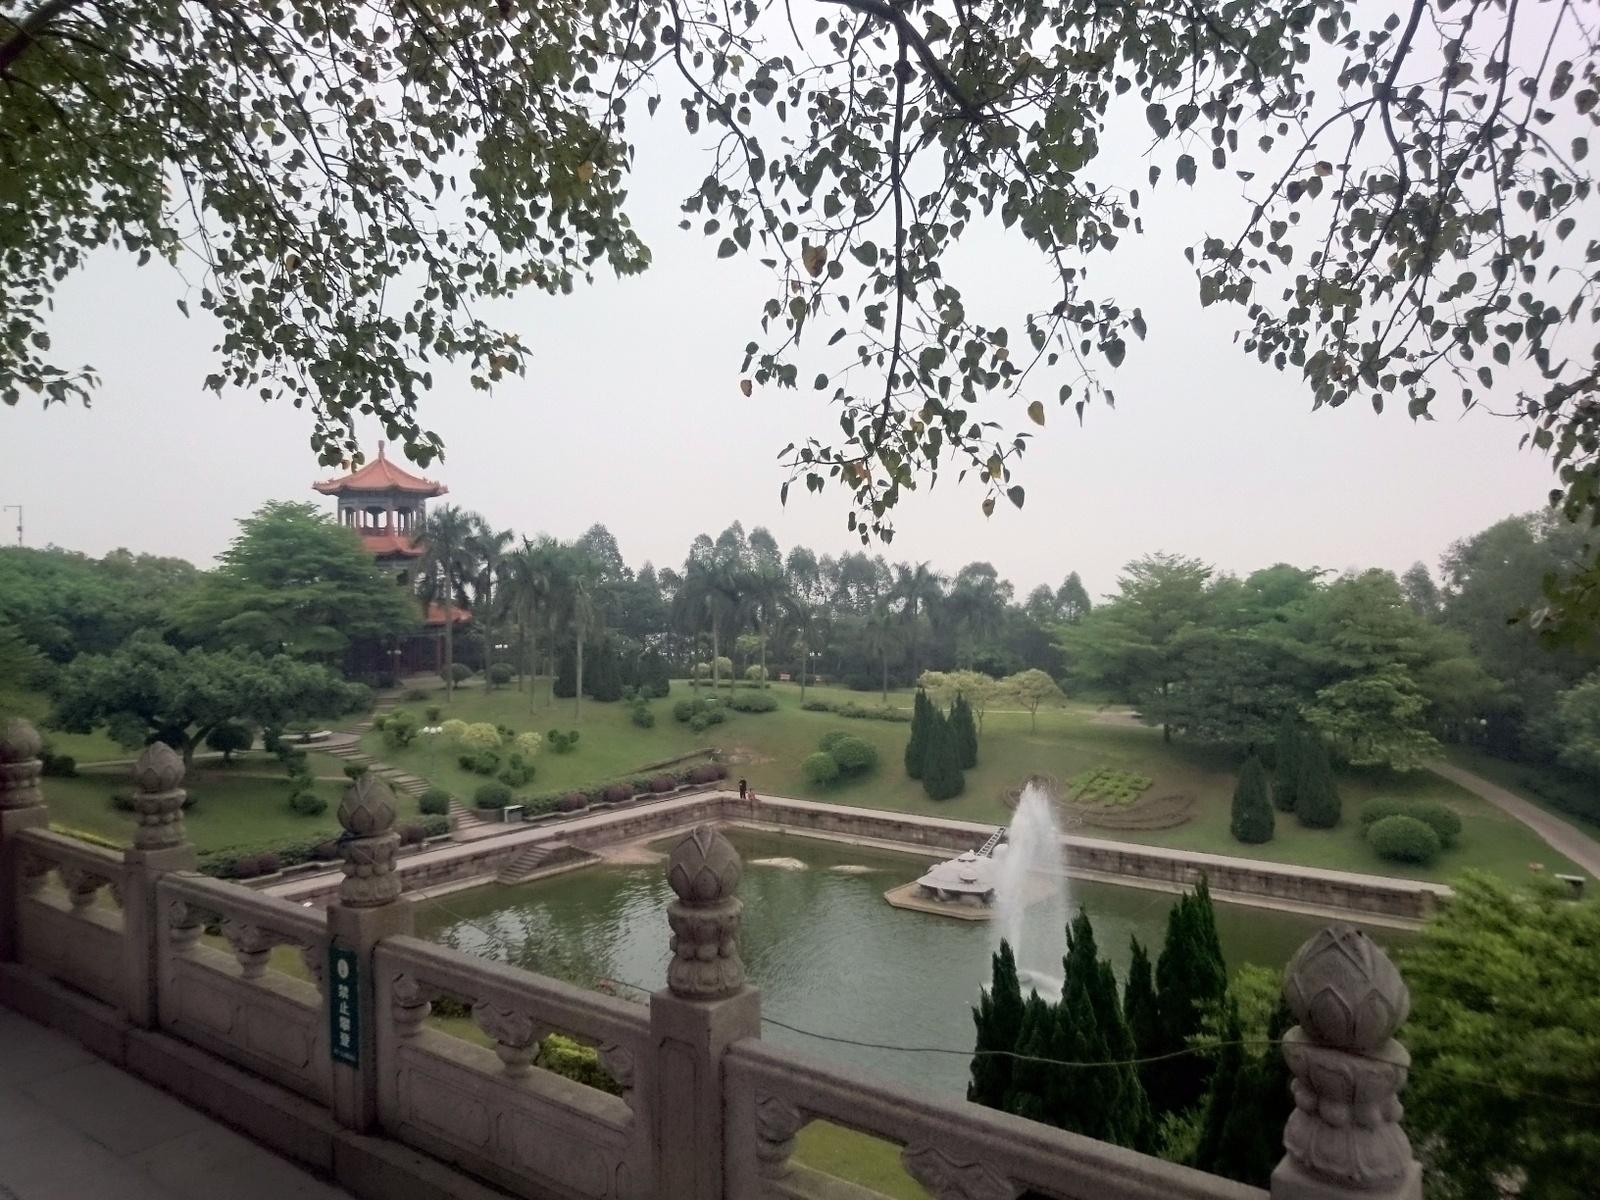 Китай. Завод устройств для «Умного дома». Учимся и учим - 42